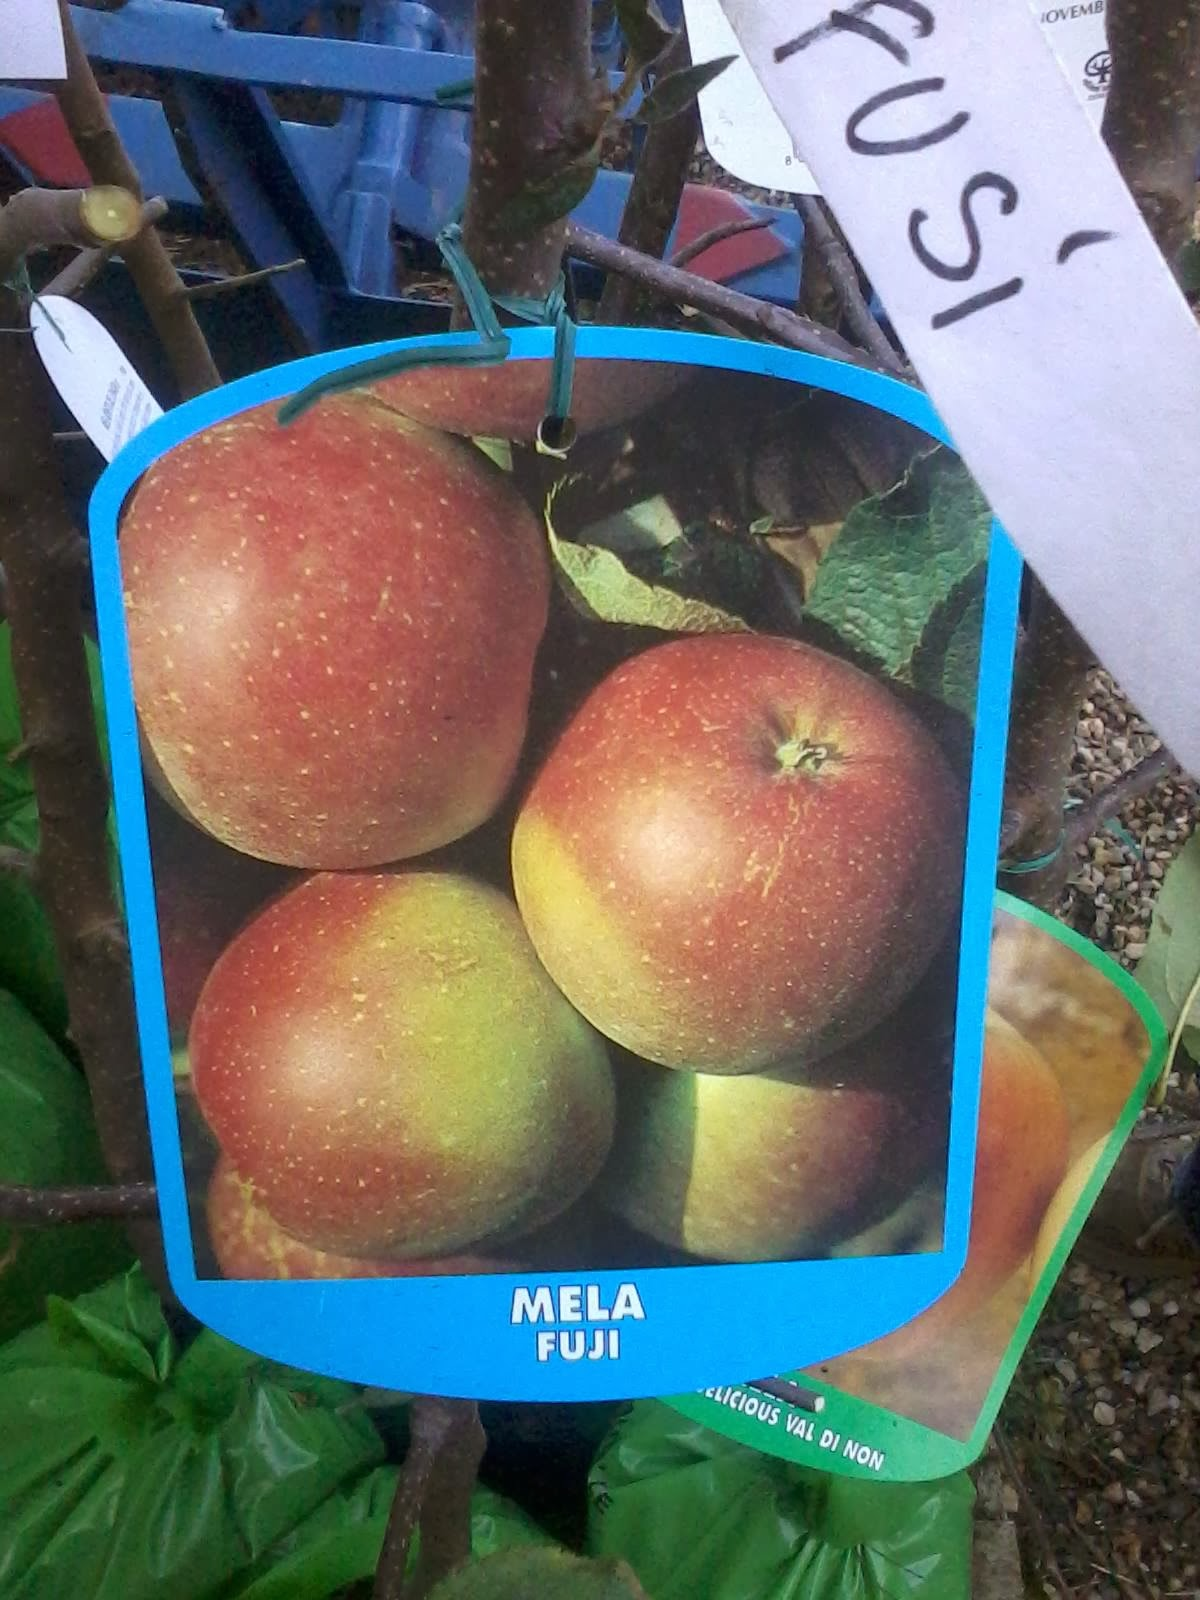 Antiche variet di mele piemontesi - Mele fuji coltivazione ...